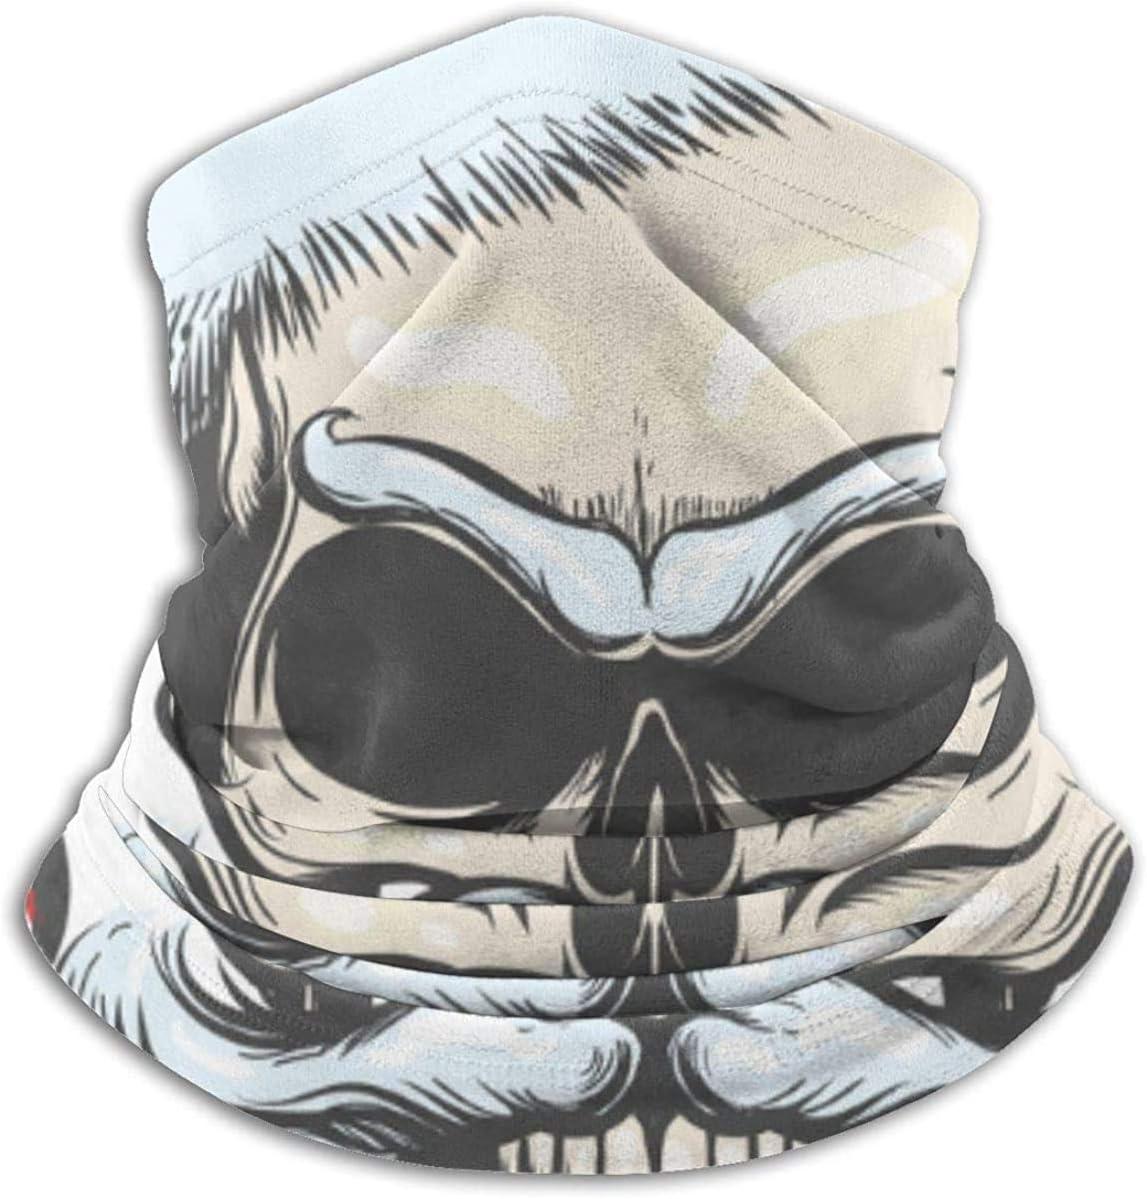 Lastbest The Skull of Santa Claus Neck Warmer Multifunction Scarf Hat Neck Gaiter Neck Cap Bala Windproof Neck Heating Wrap Outdoor Sports